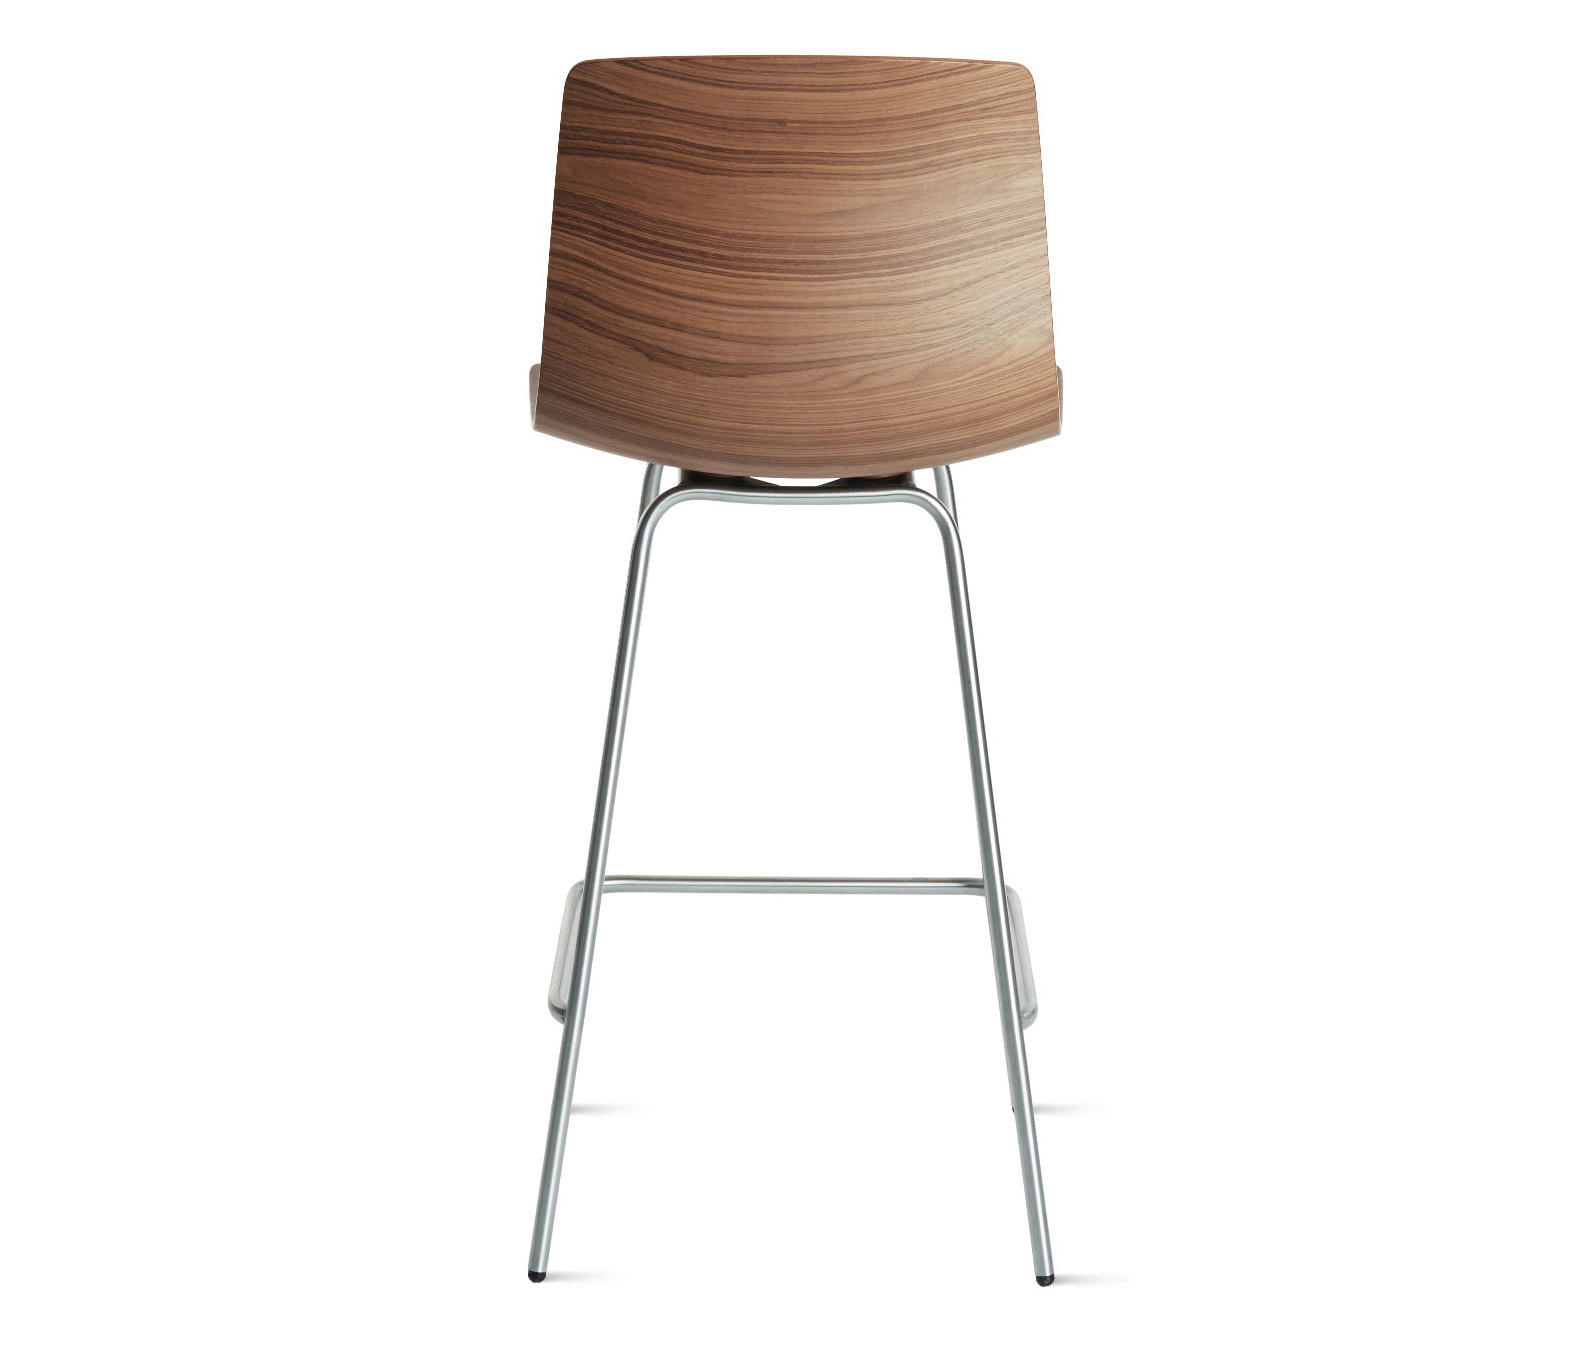 Strange Loku Counter Stool Designer Furniture Architonic Beatyapartments Chair Design Images Beatyapartmentscom